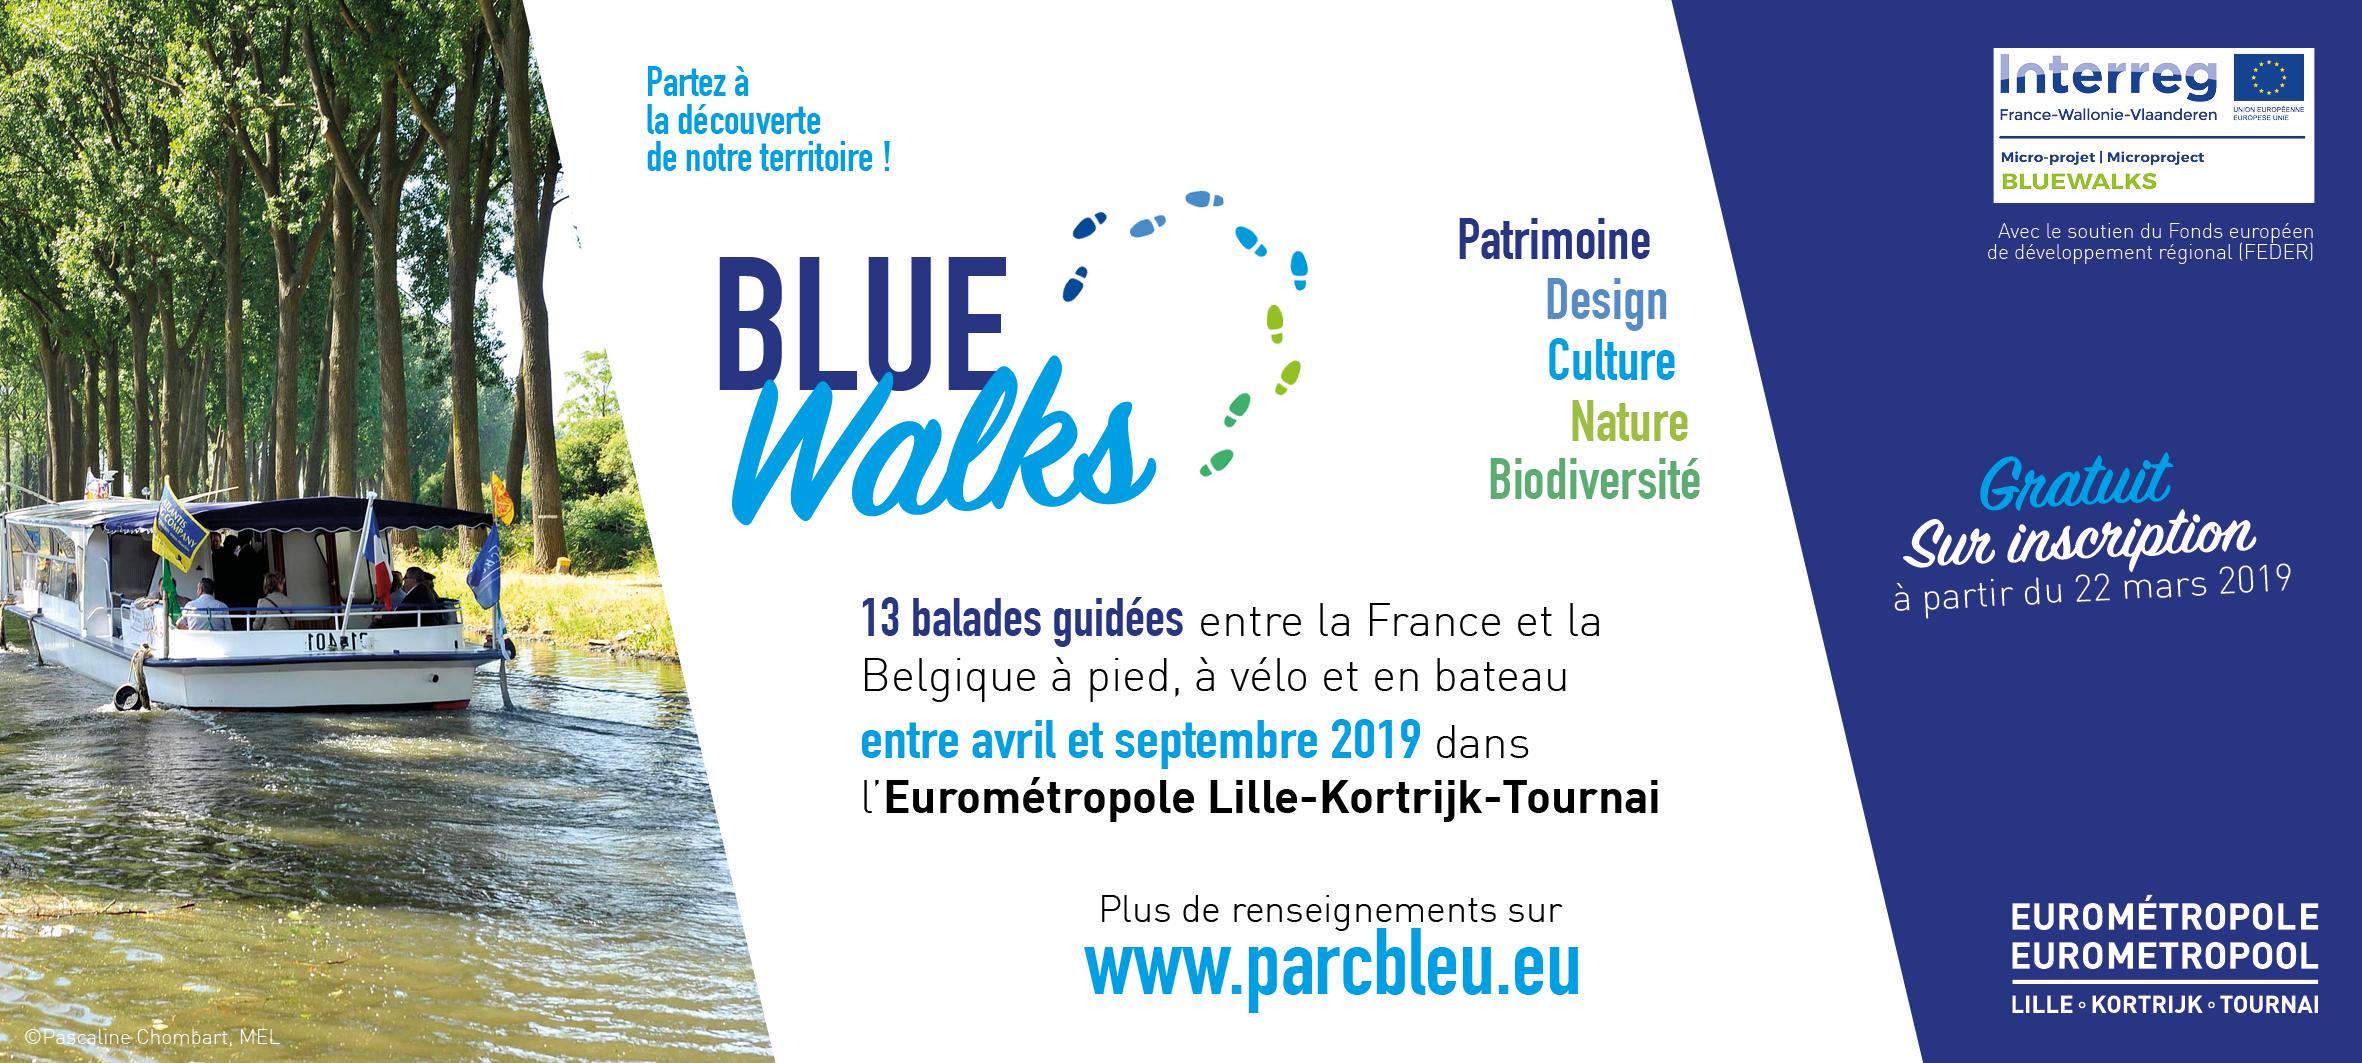 BlueWalks-Balade Espierres & Balade des Astuces